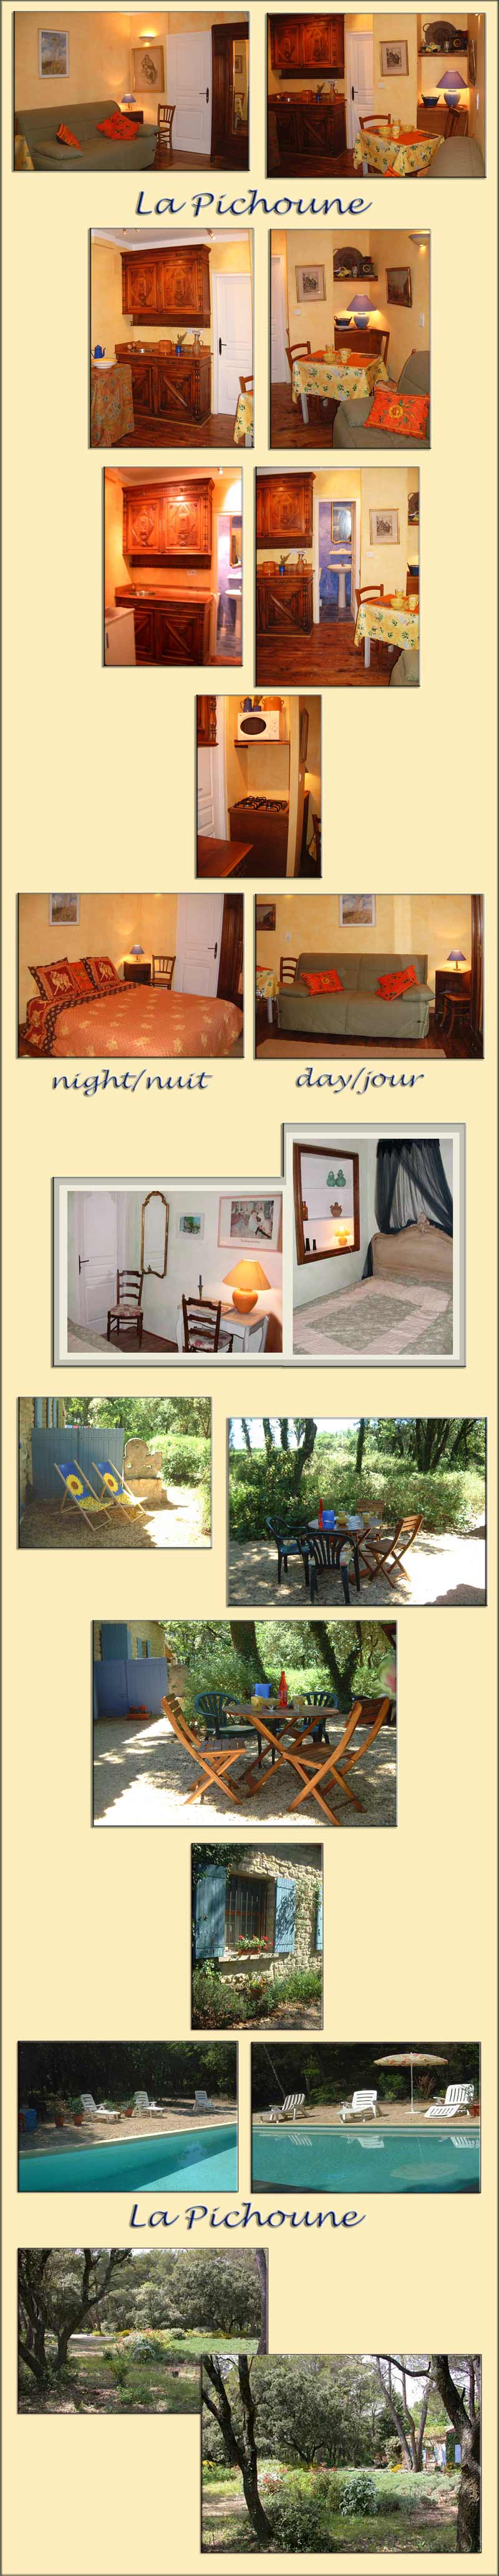 Provence villa rental, pool, near Mazan, Carpentras, Avignon, Mont Ventoux - large photos